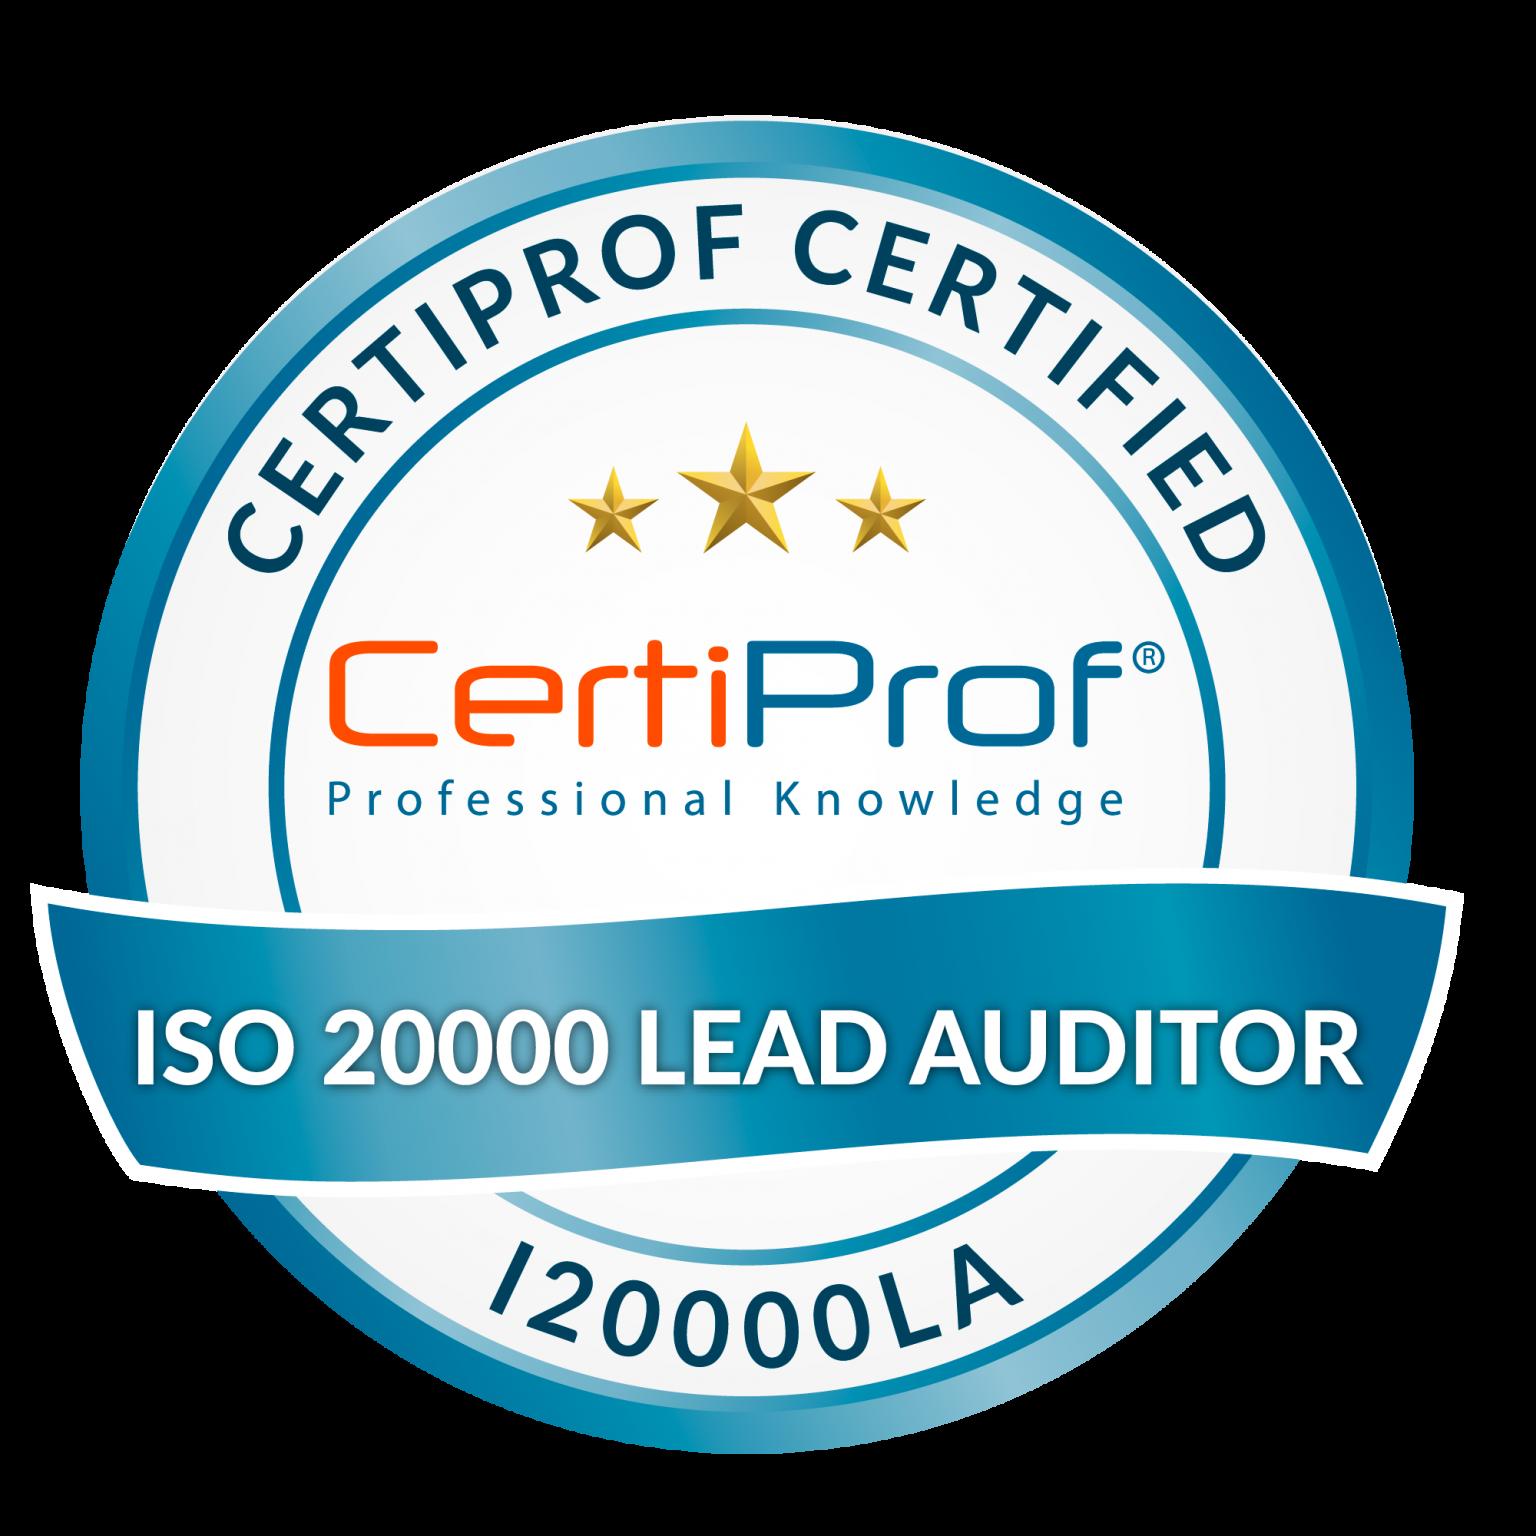 Curso de CertiProf Certification ISO/IEC 20000 Auditor/Lead Auditor (I20000A/LA)